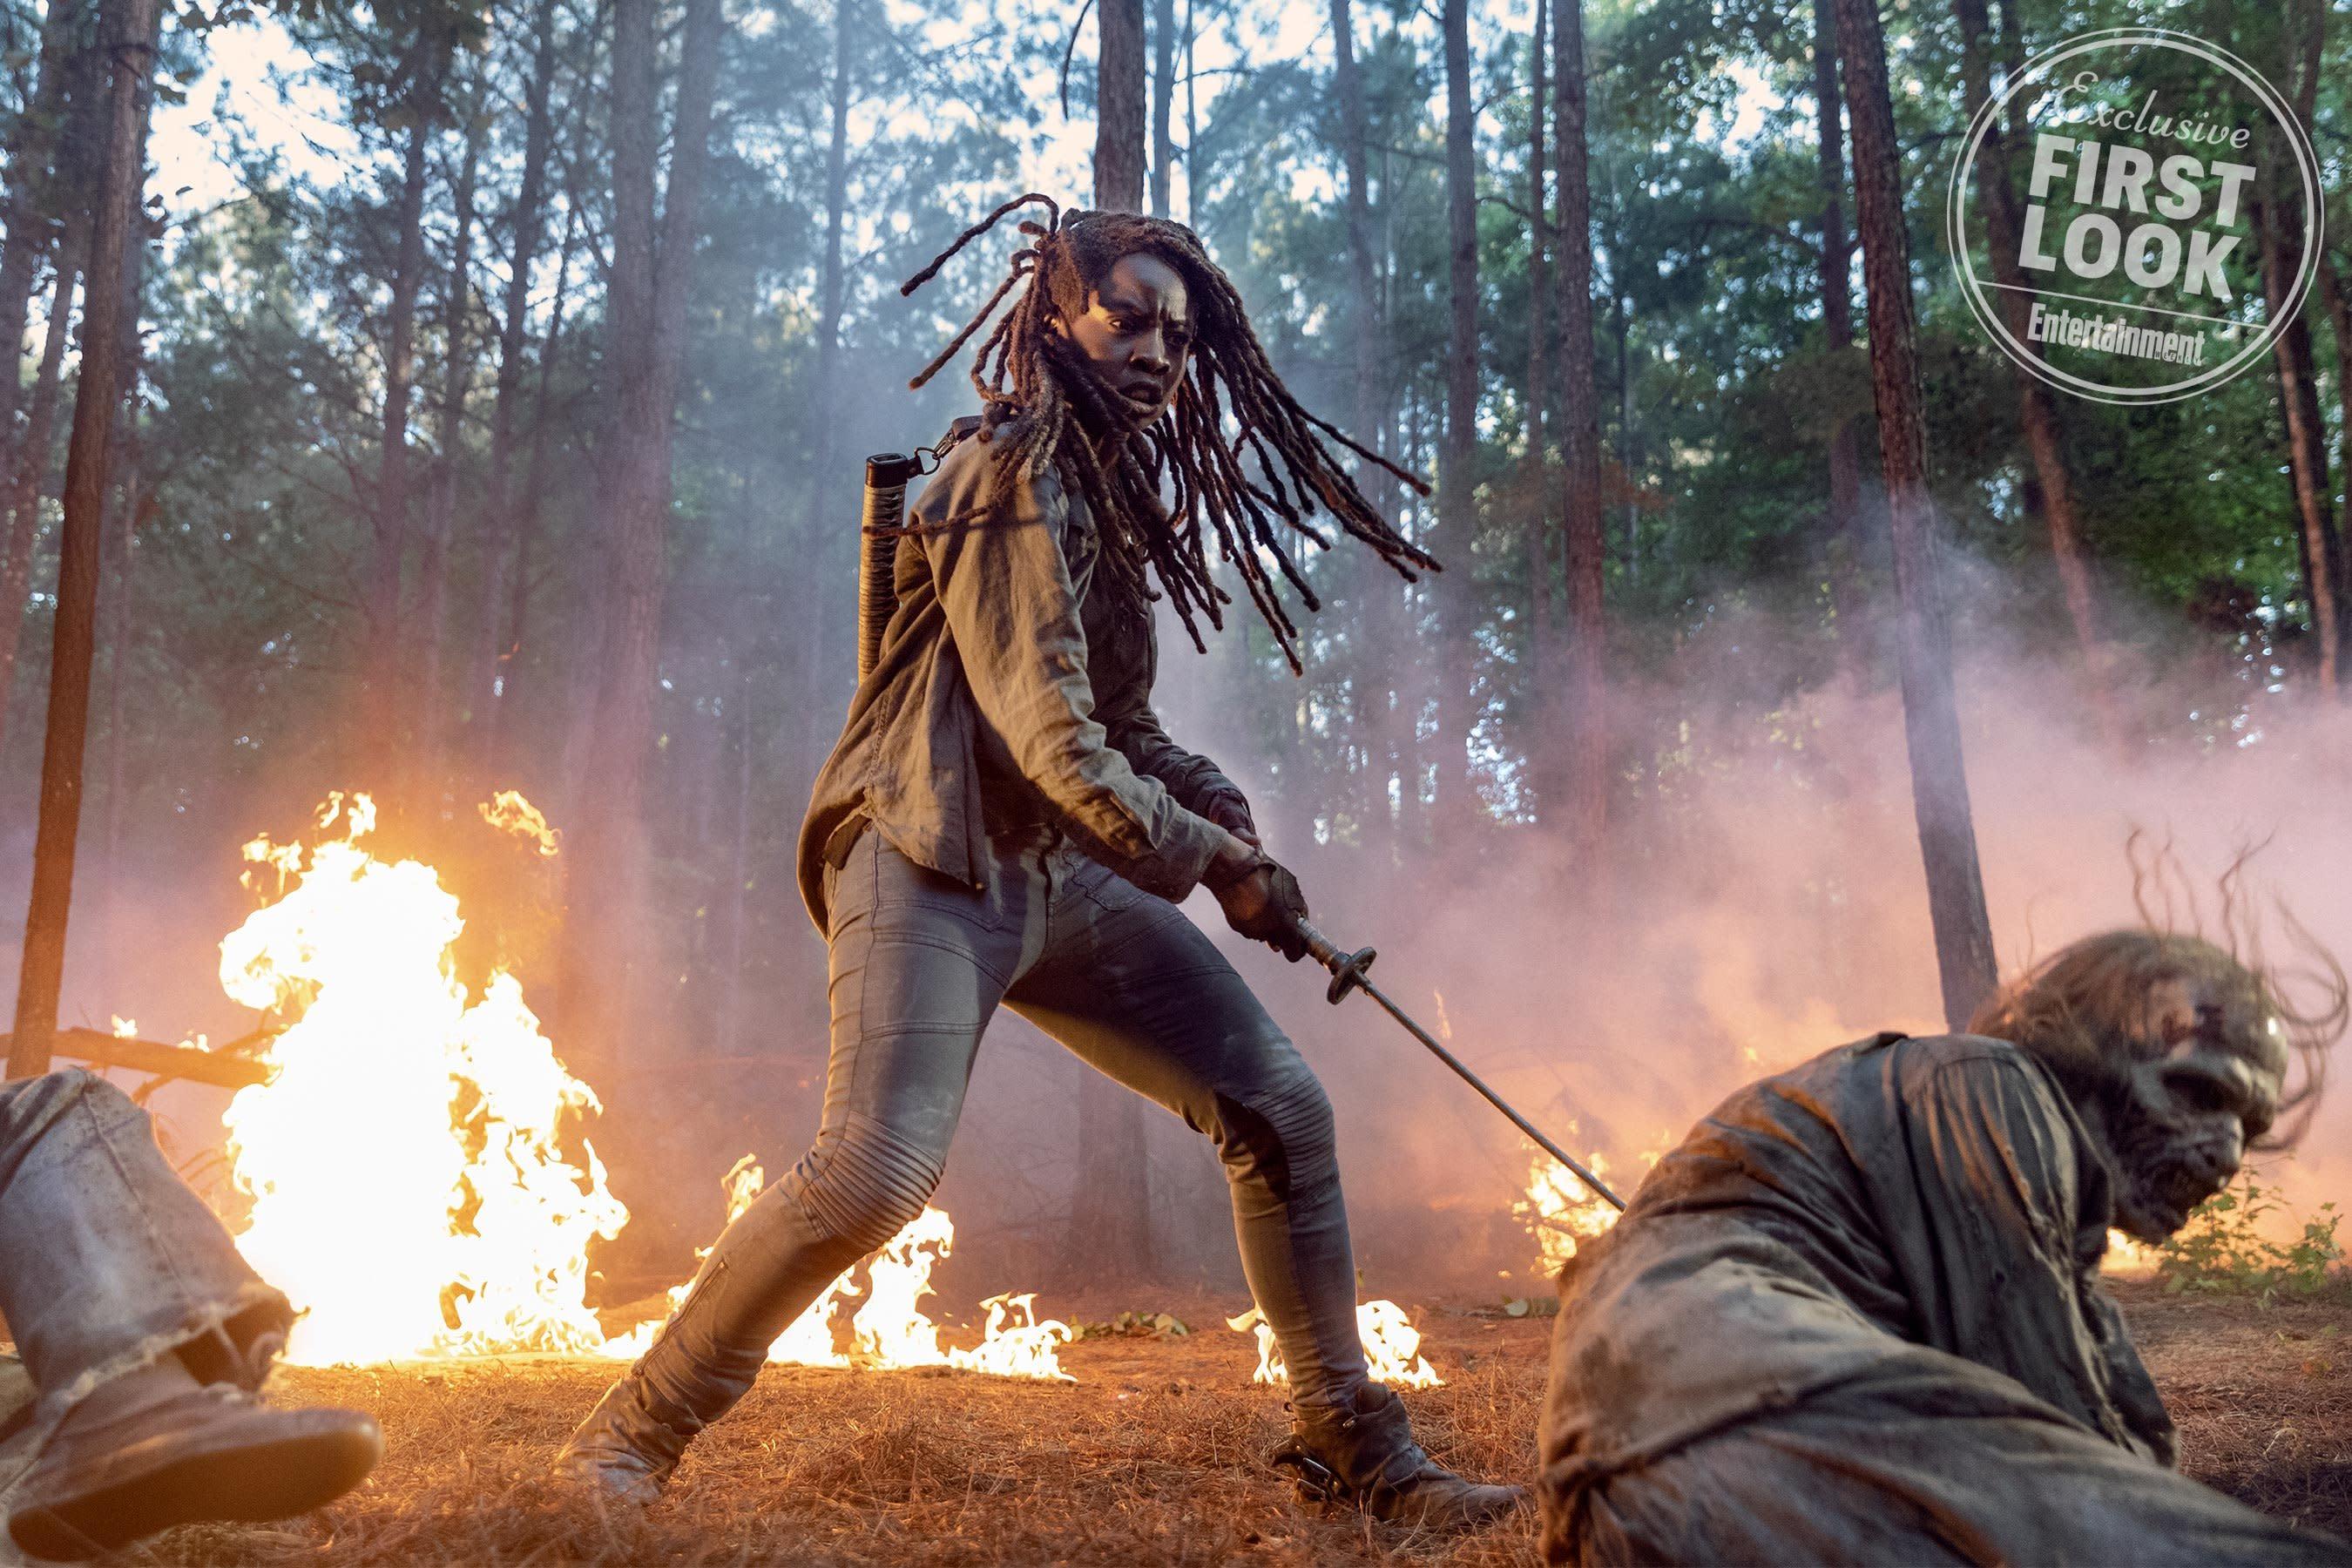 See Michonne in a fiery first image from The Walking Dead season 10